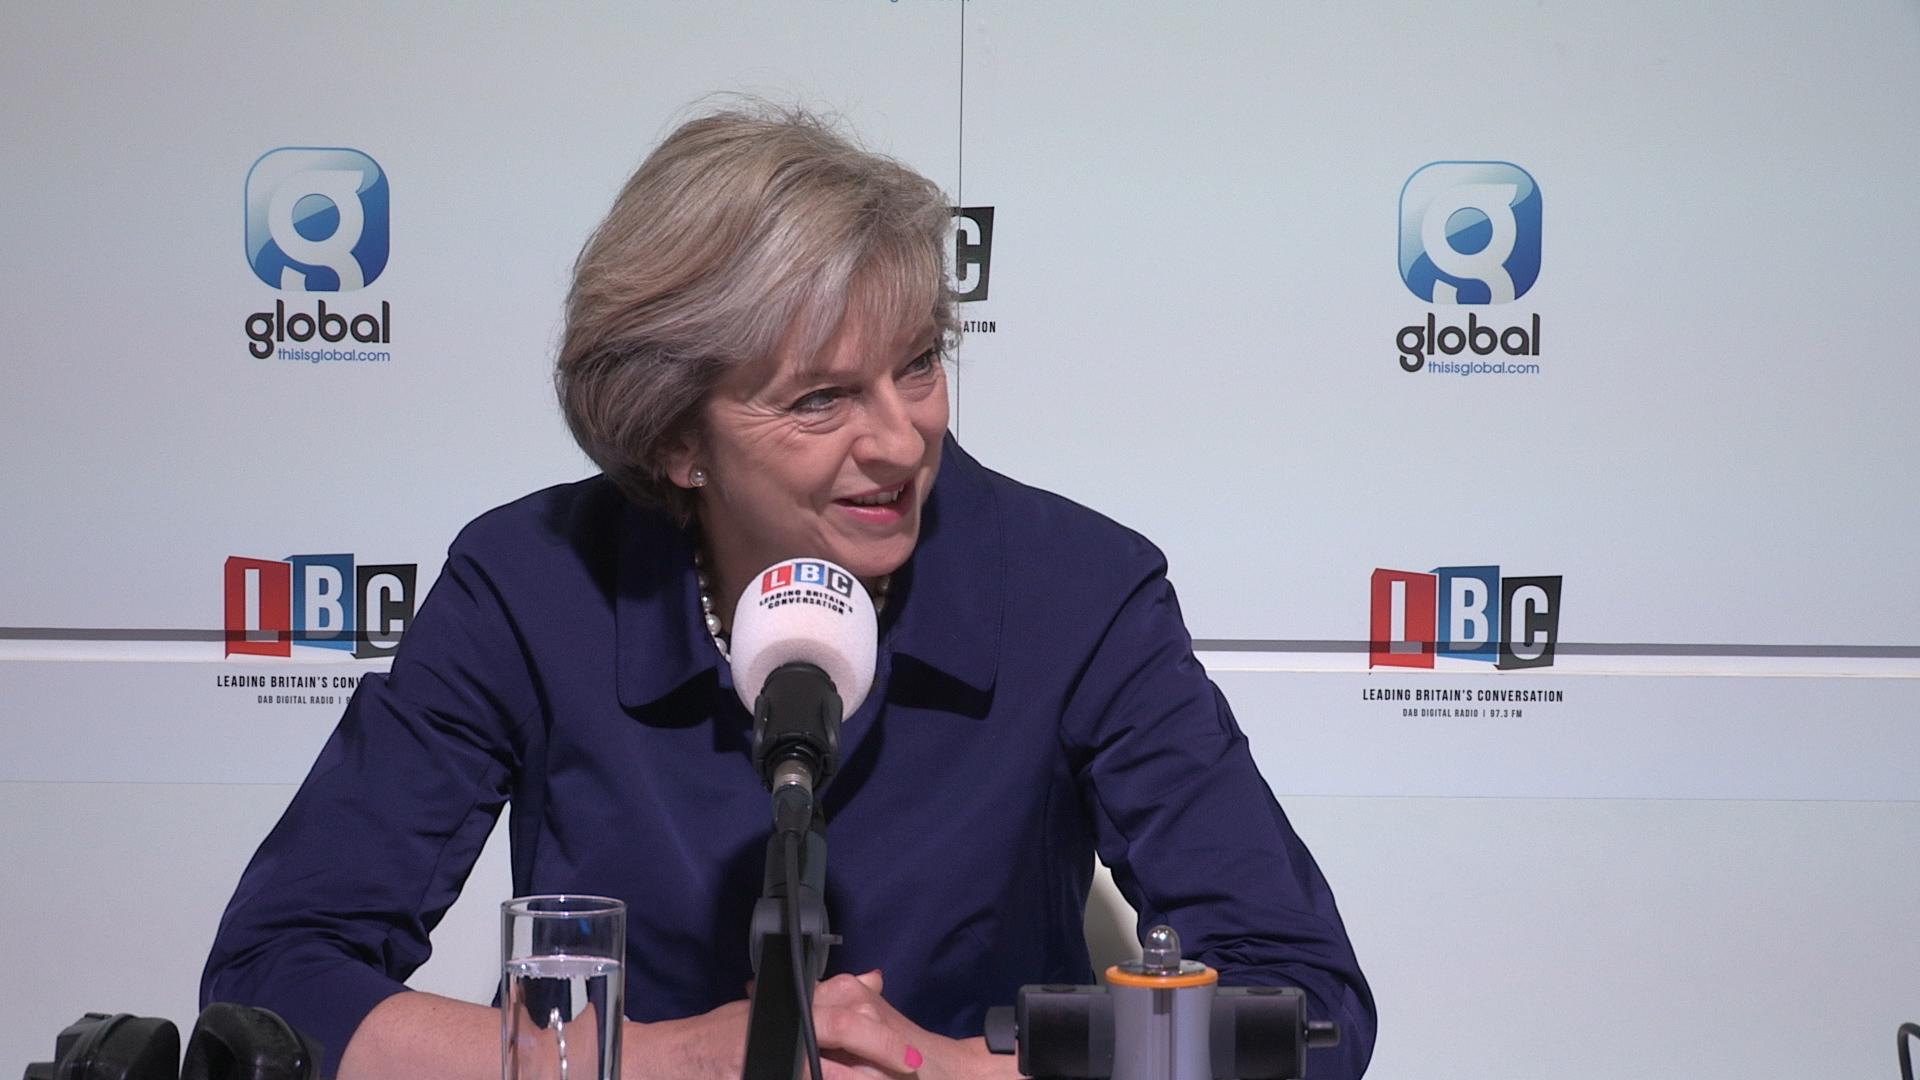 Theresa May LBC conference